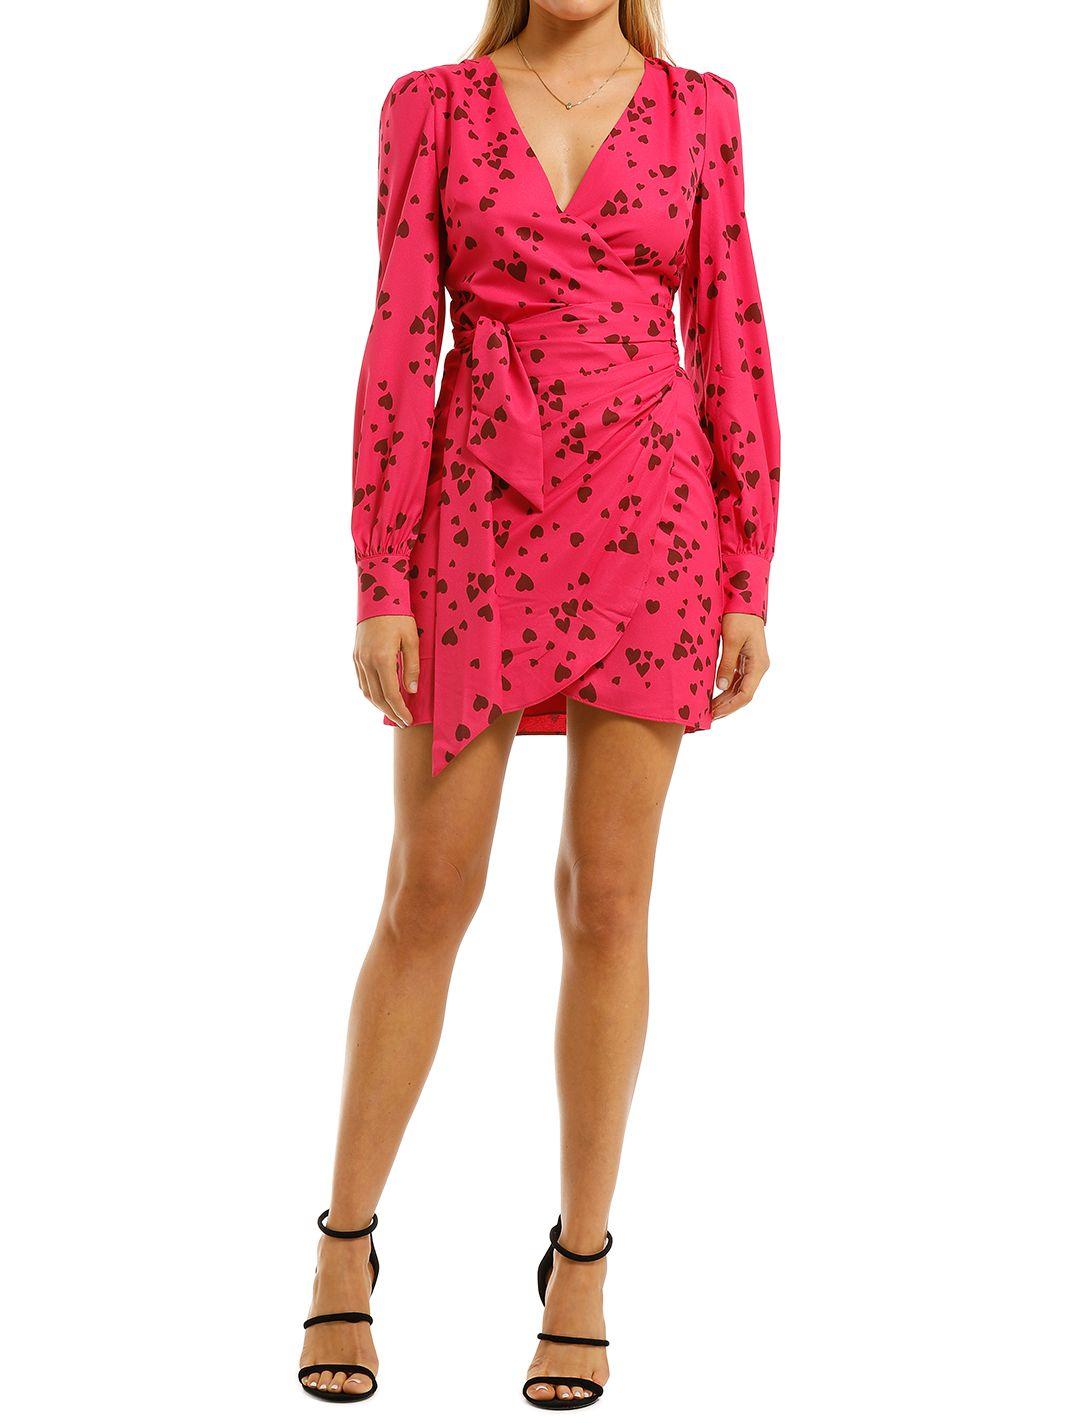 Vestire-Never-Been-Kissed-Wrap-Mini-Dress-Heart-Print-Front